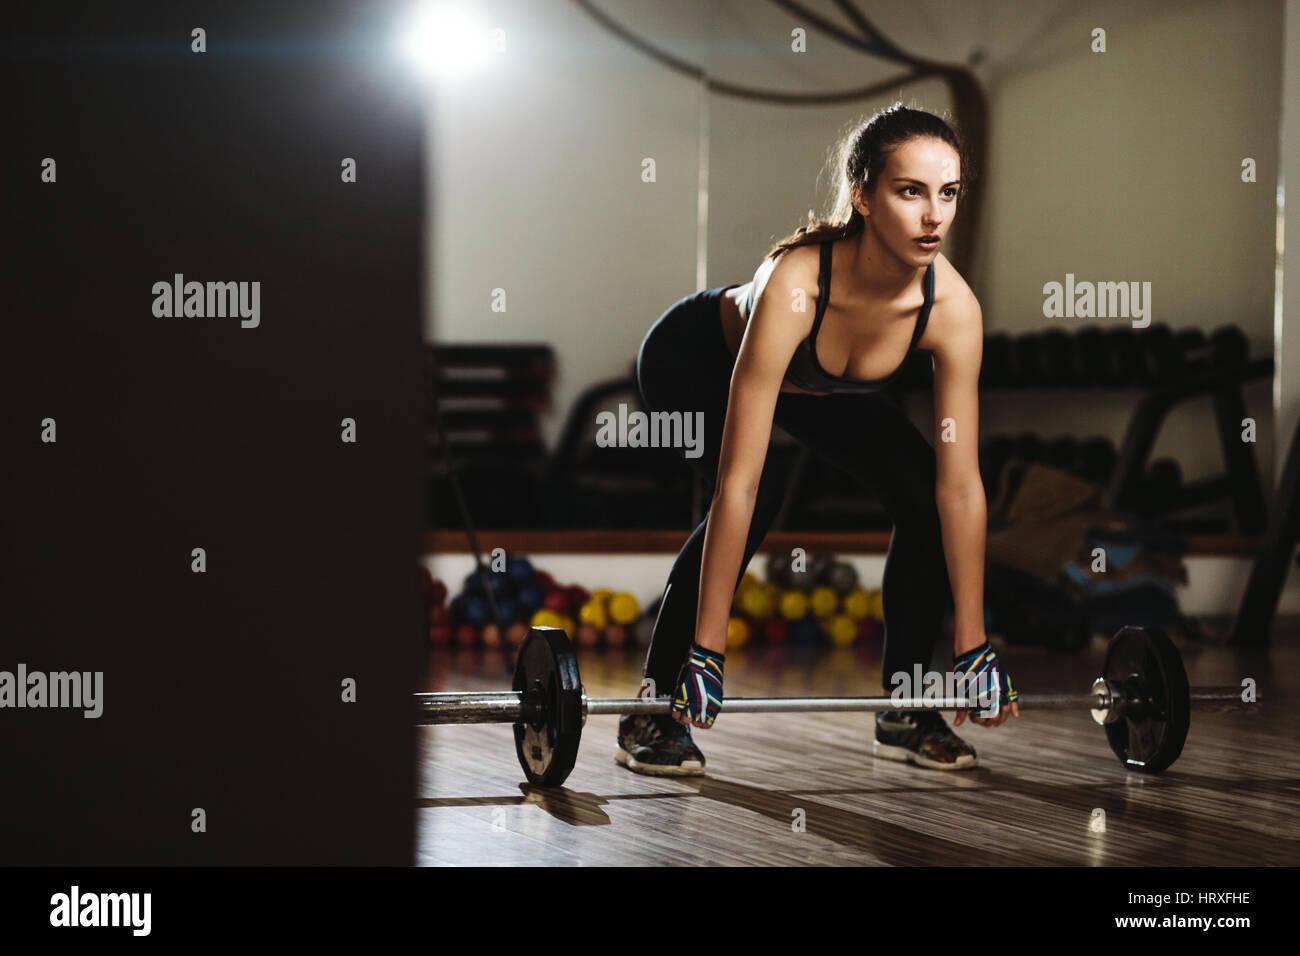 Fitness Frau Gewichtheben Kreuzheben. Fitness Model Mädchen Gewichtheben im Fitness-Studio. Stockbild